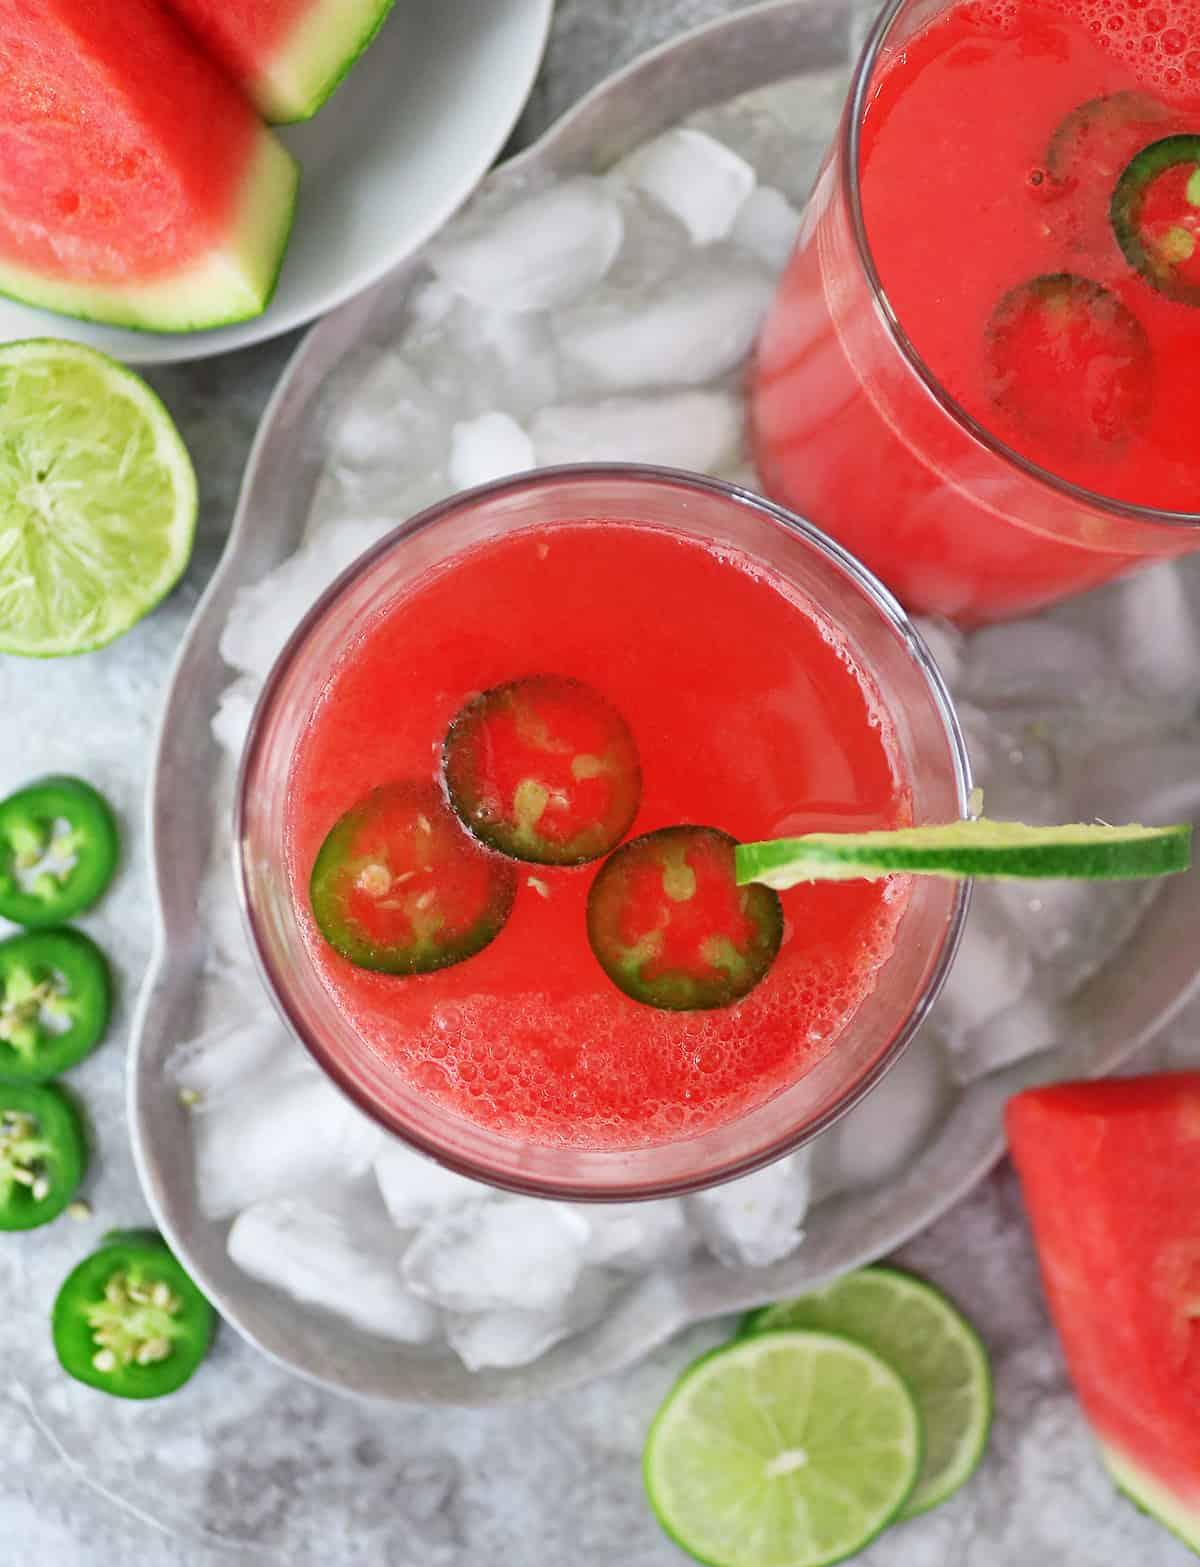 easy mocktail for cinco de mayo - spicy watermelon paloma